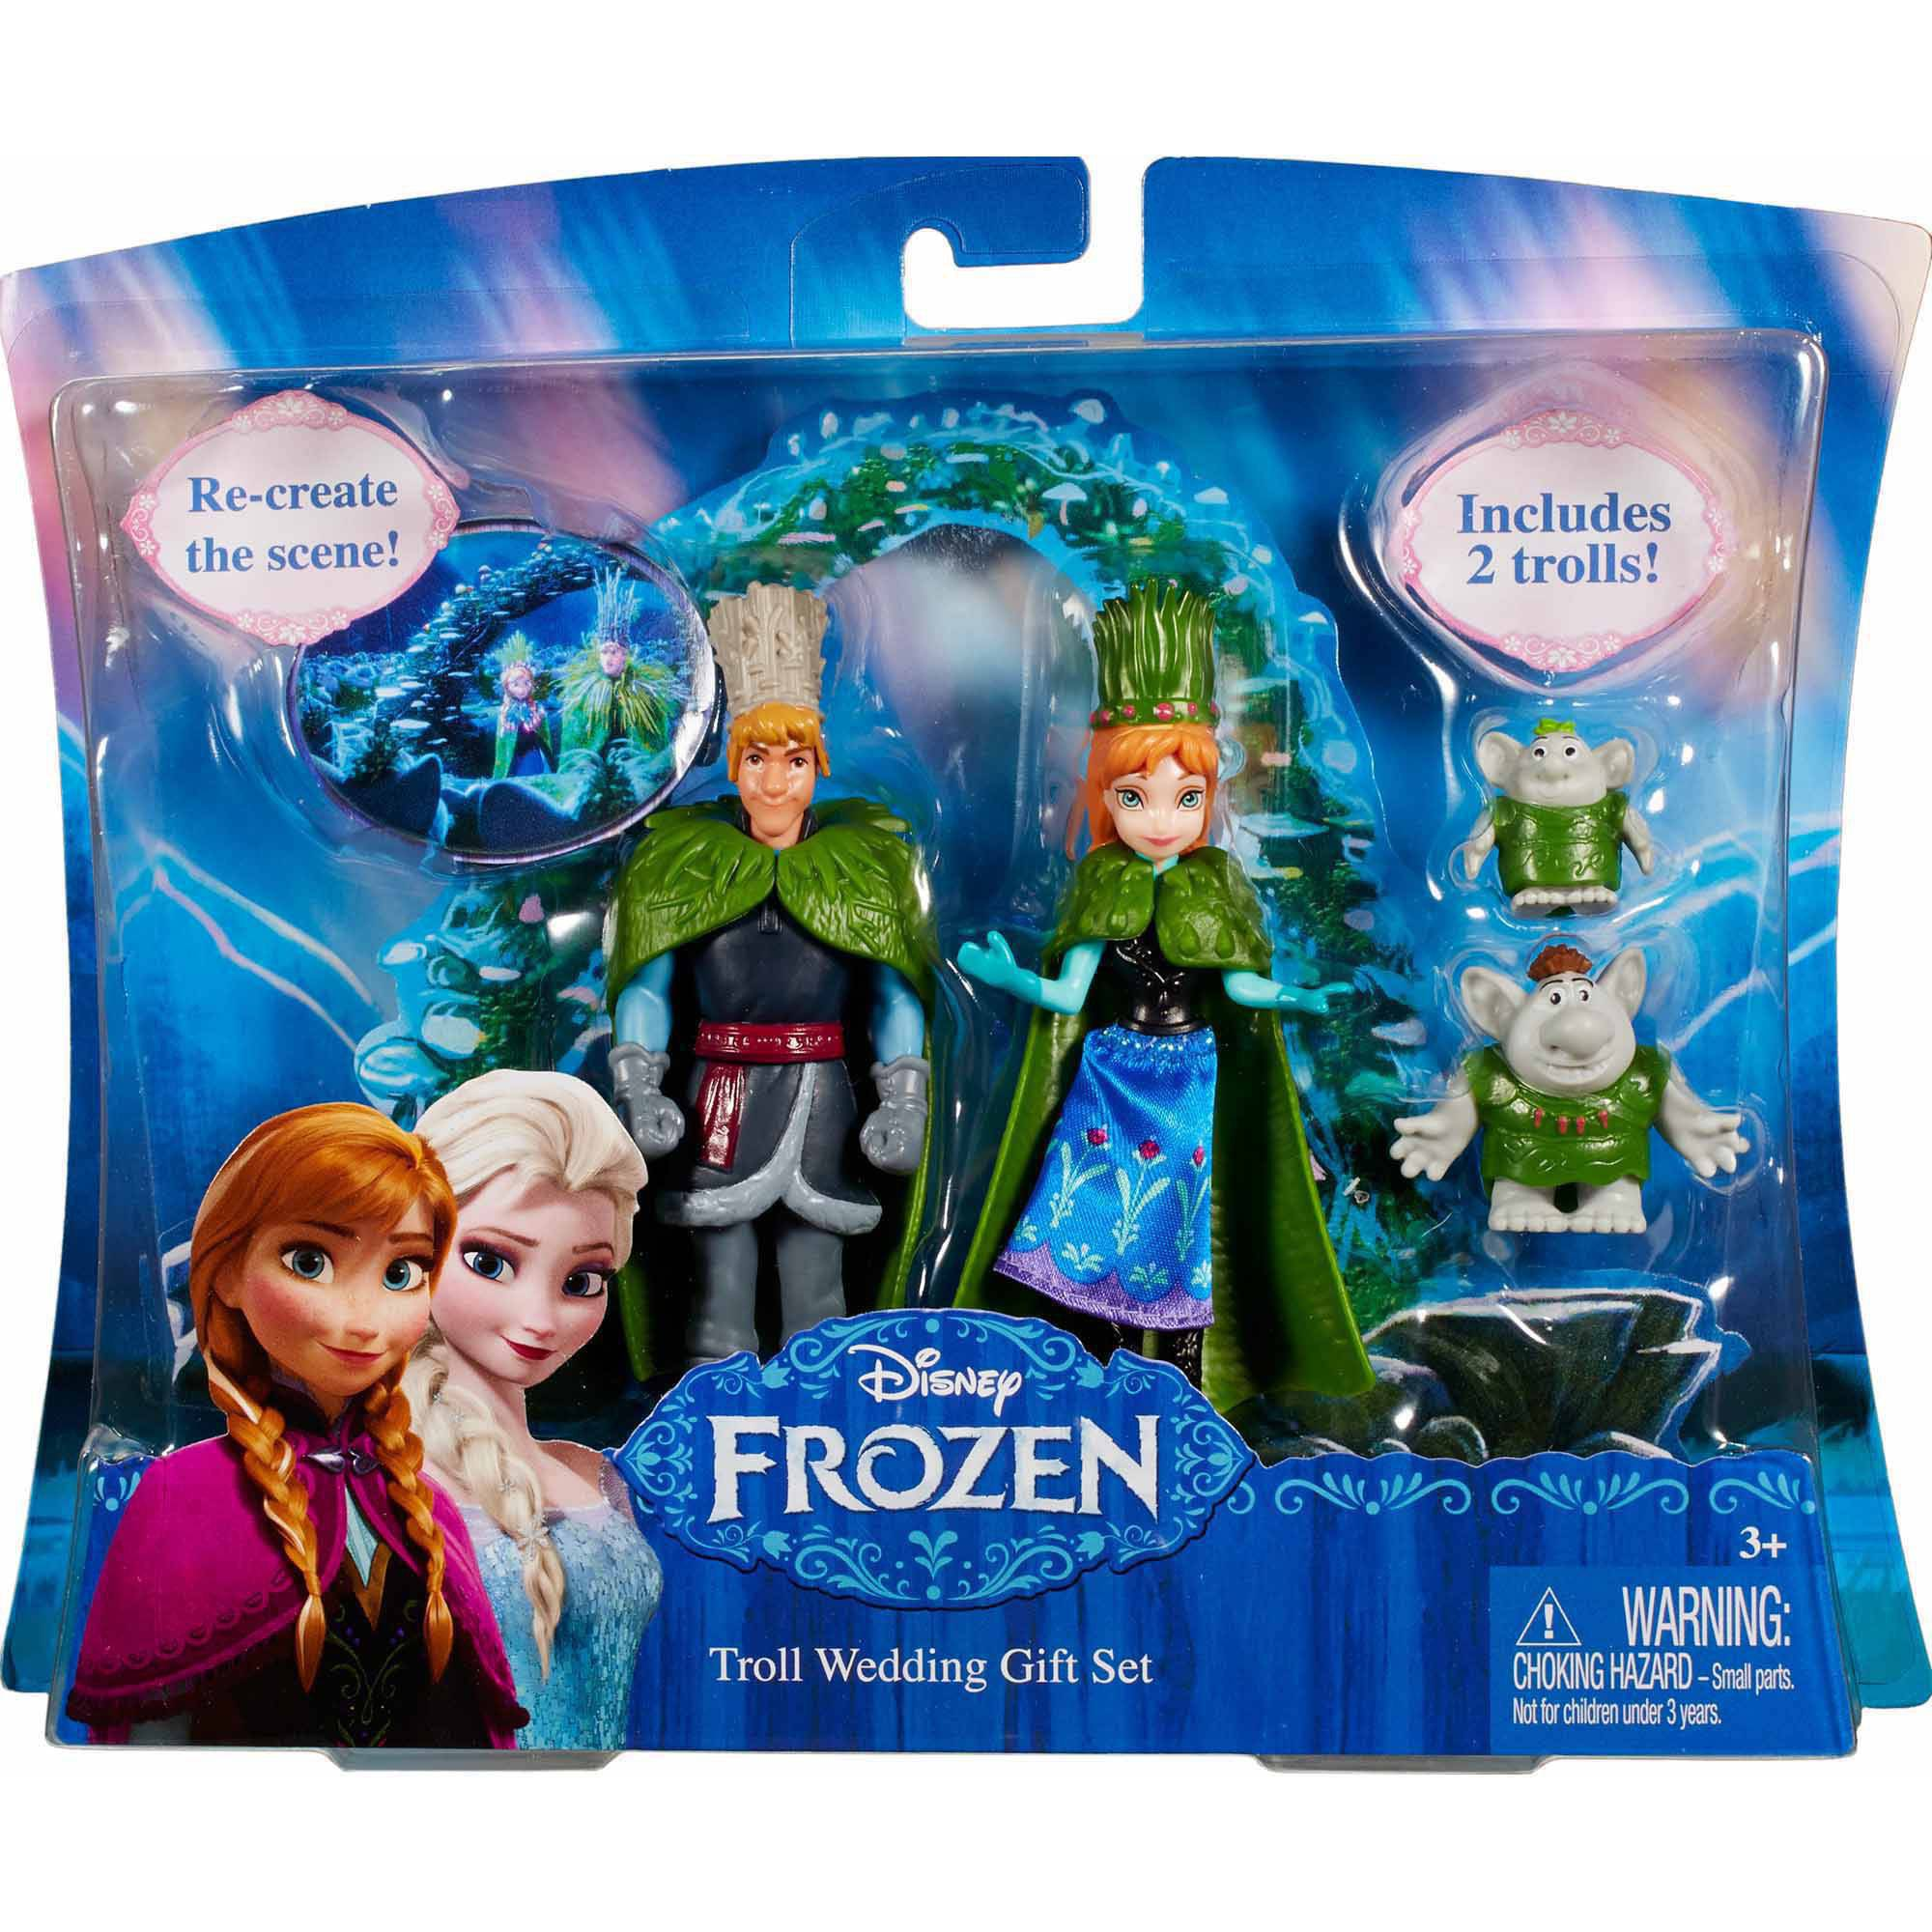 Wedding Gifts For Bride And Groom Walmart : Ideas Walmart Wedding Gifts disney frozen small doll wedding gift set ...